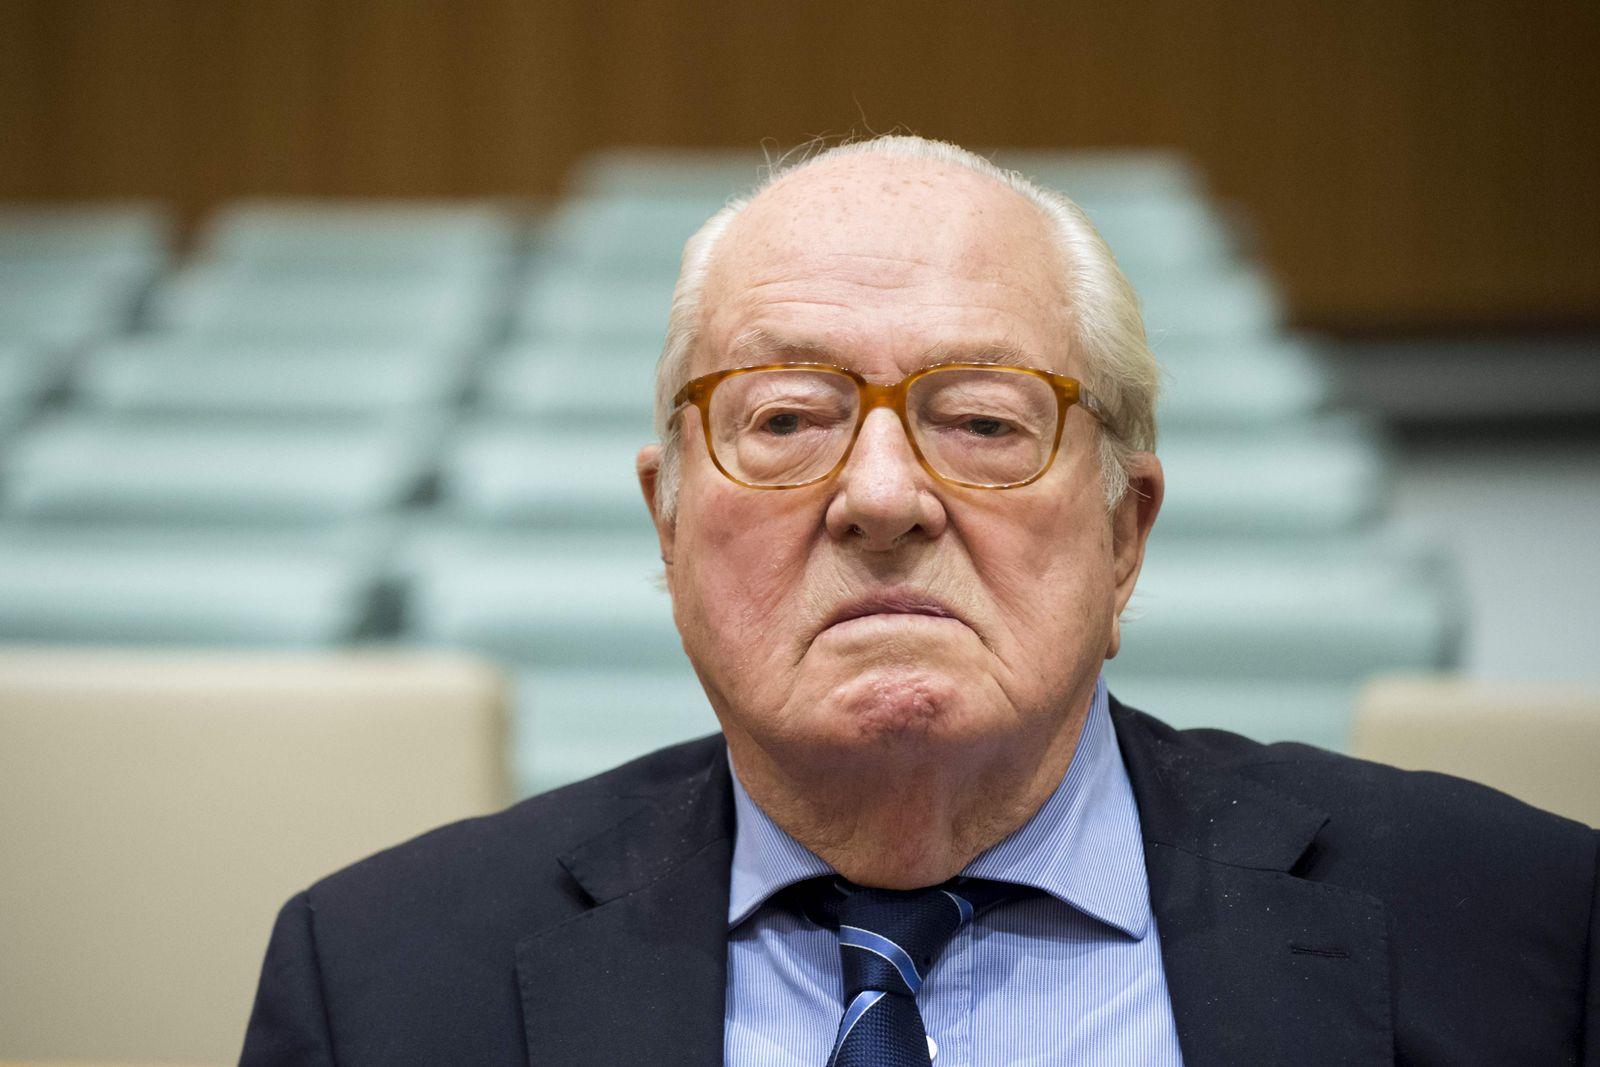 FILES-LUXEMBOURG-EU-POLITICS-COURT